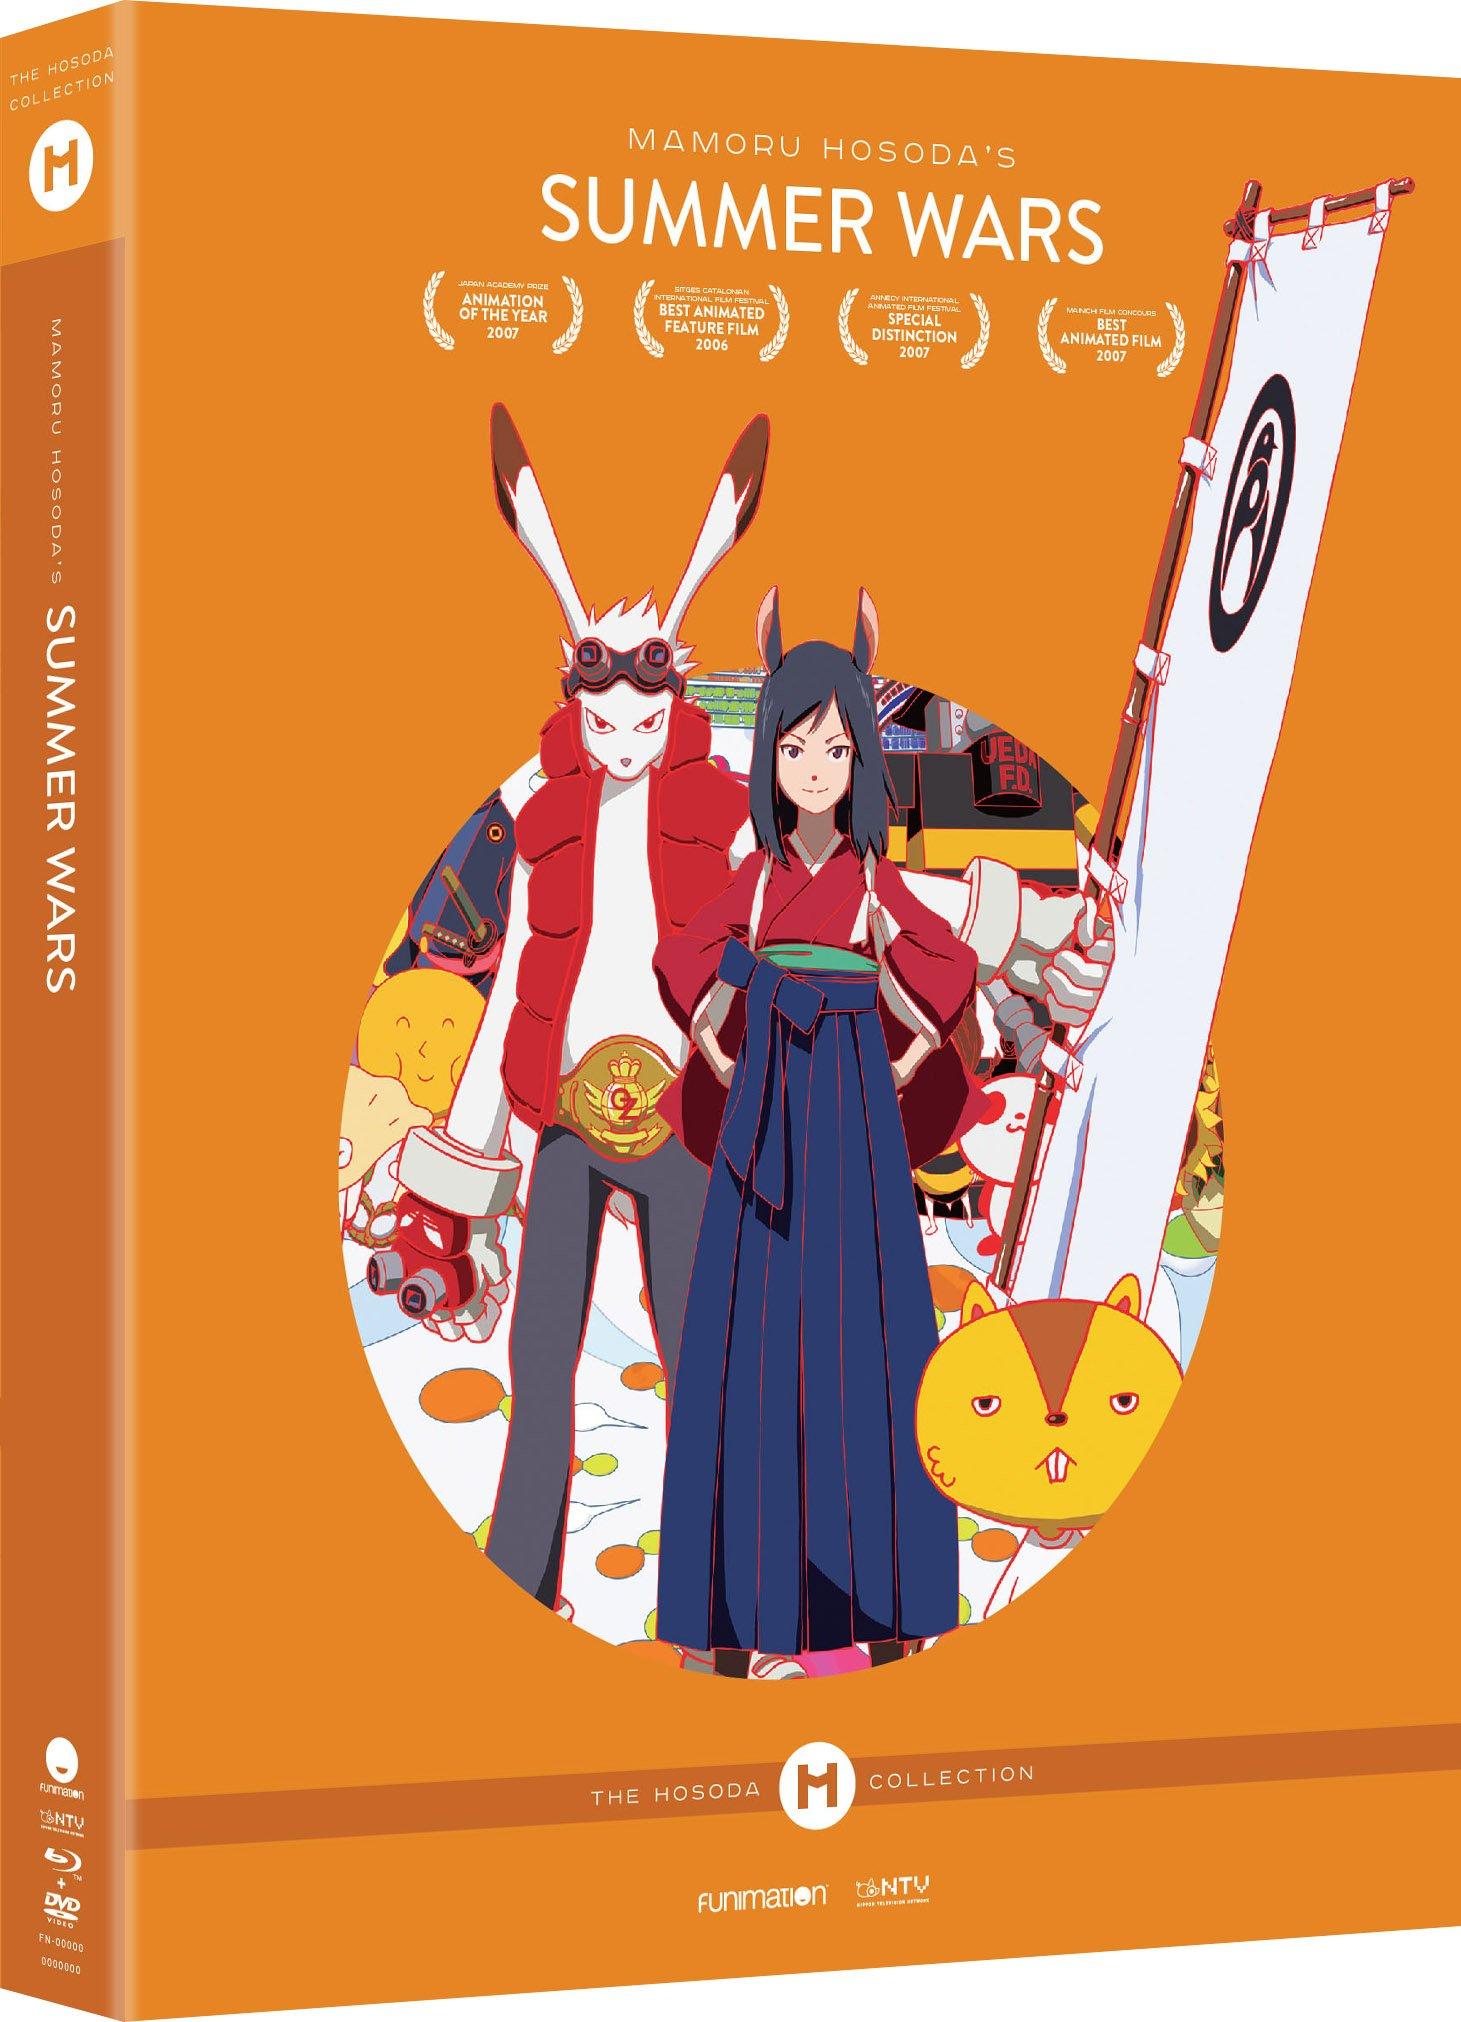 Blu-ray : Summer Wars: Hosoda Collection? Collector's Edition (With DVD, Collector's Edition, Ultraviolet Digital Copy, 3 Pack, )